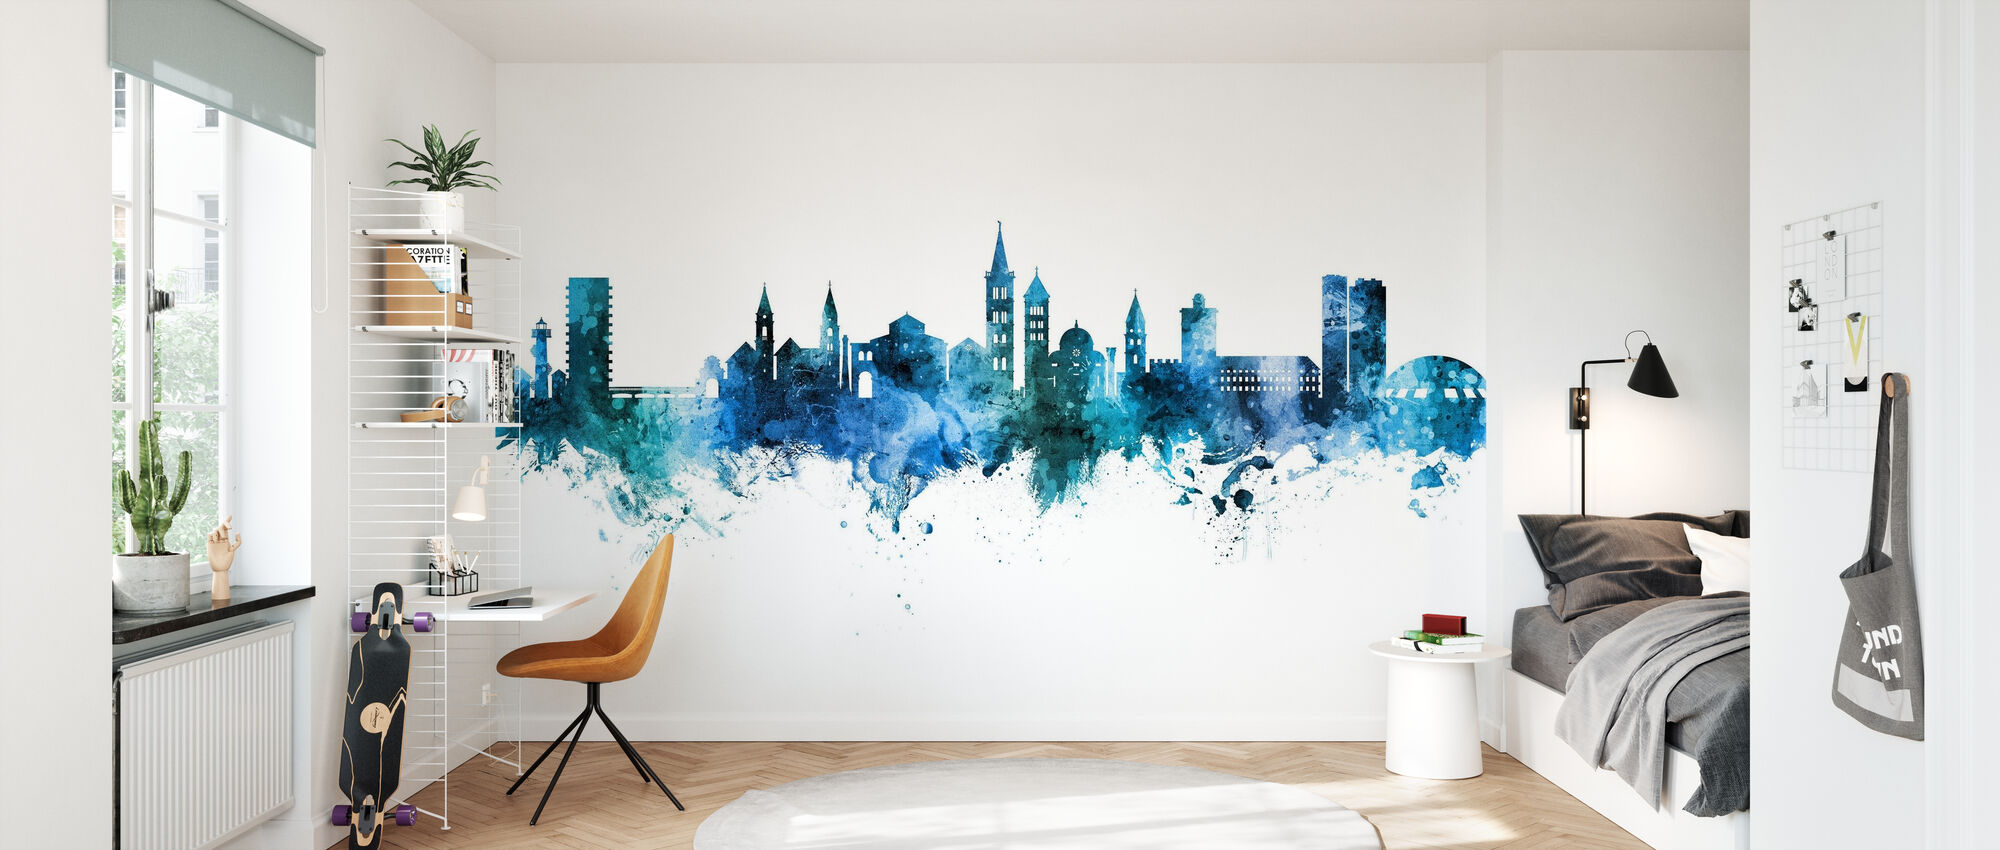 Zadar Croatia Skyline - Wallpaper - Kids Room